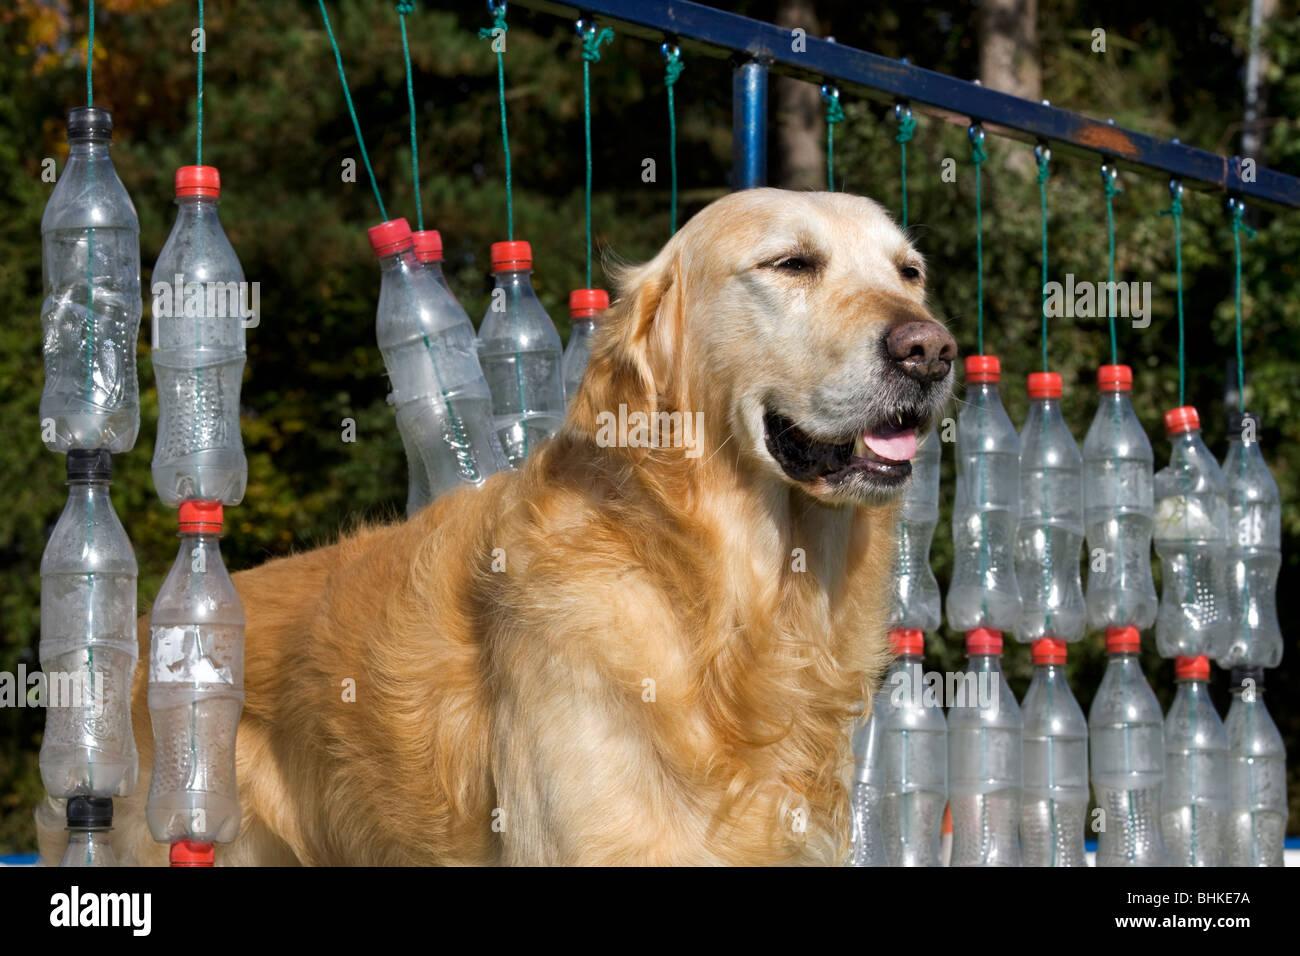 Golden Retriever (Canis Lupus Familiaris) am Hindernis-Parcours Stockbild